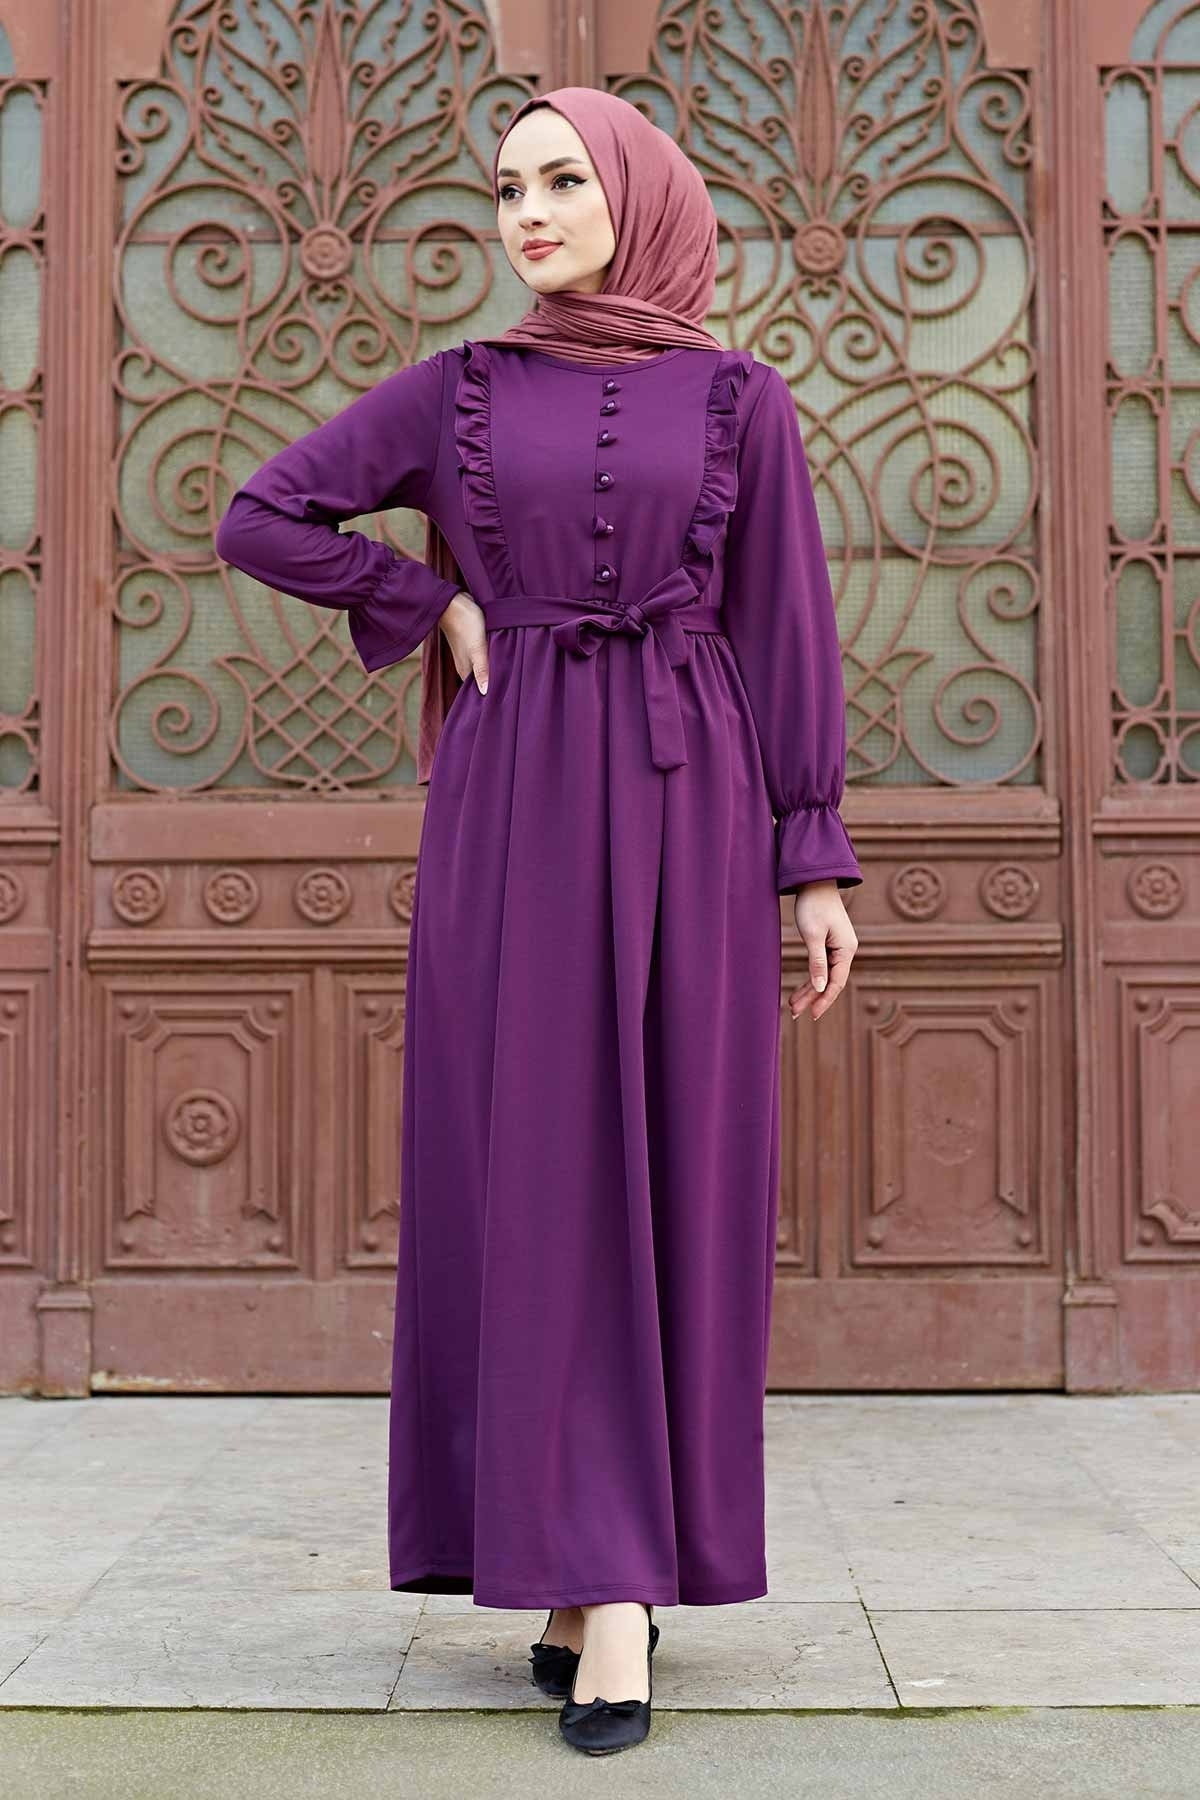 Abaya Long Muslim Women's Dress 2021 Islamic Clothes Turkey Dubai Abaya  kaftan dresses for women modest abayas for women cross border women s clothing vintage printed palace style large swing dress dubai long dress clothes for muslim women